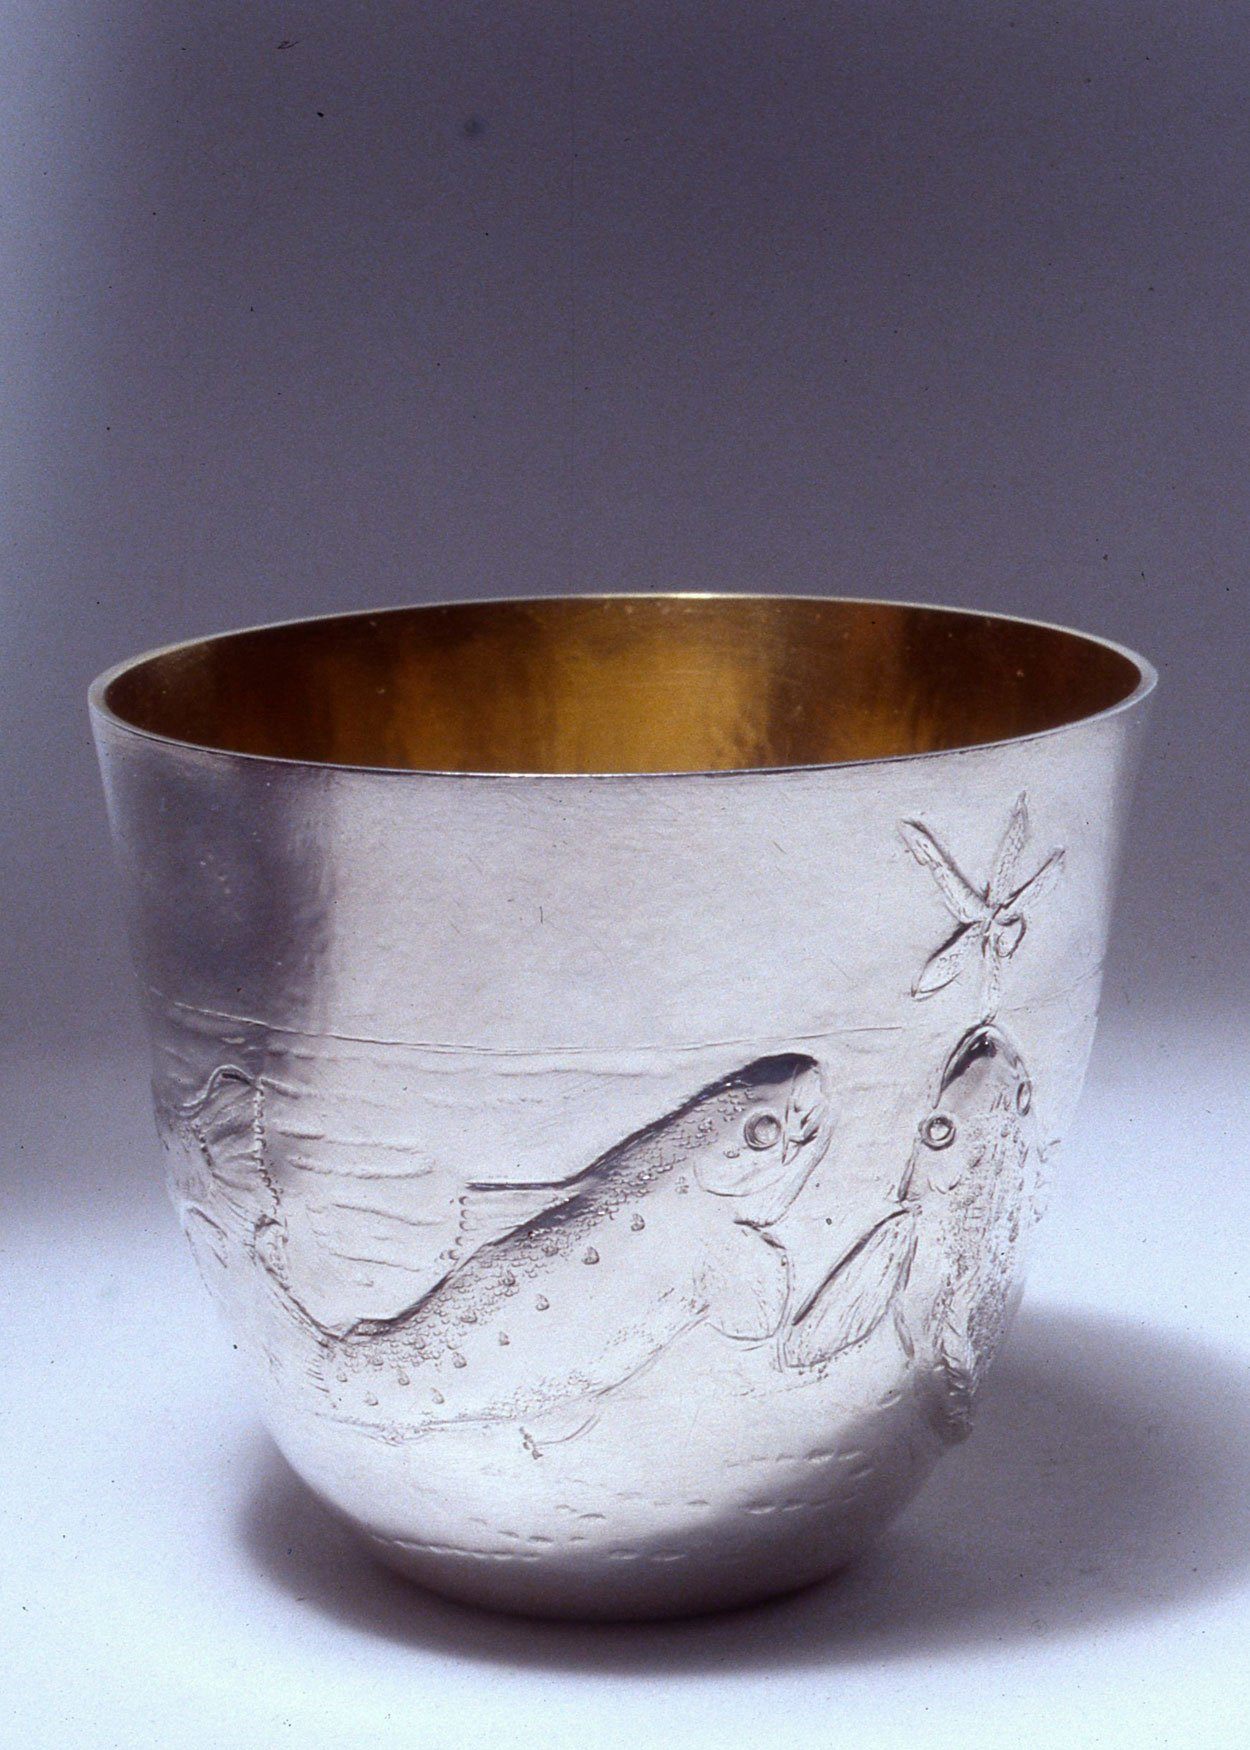 Trout Whisky beaker